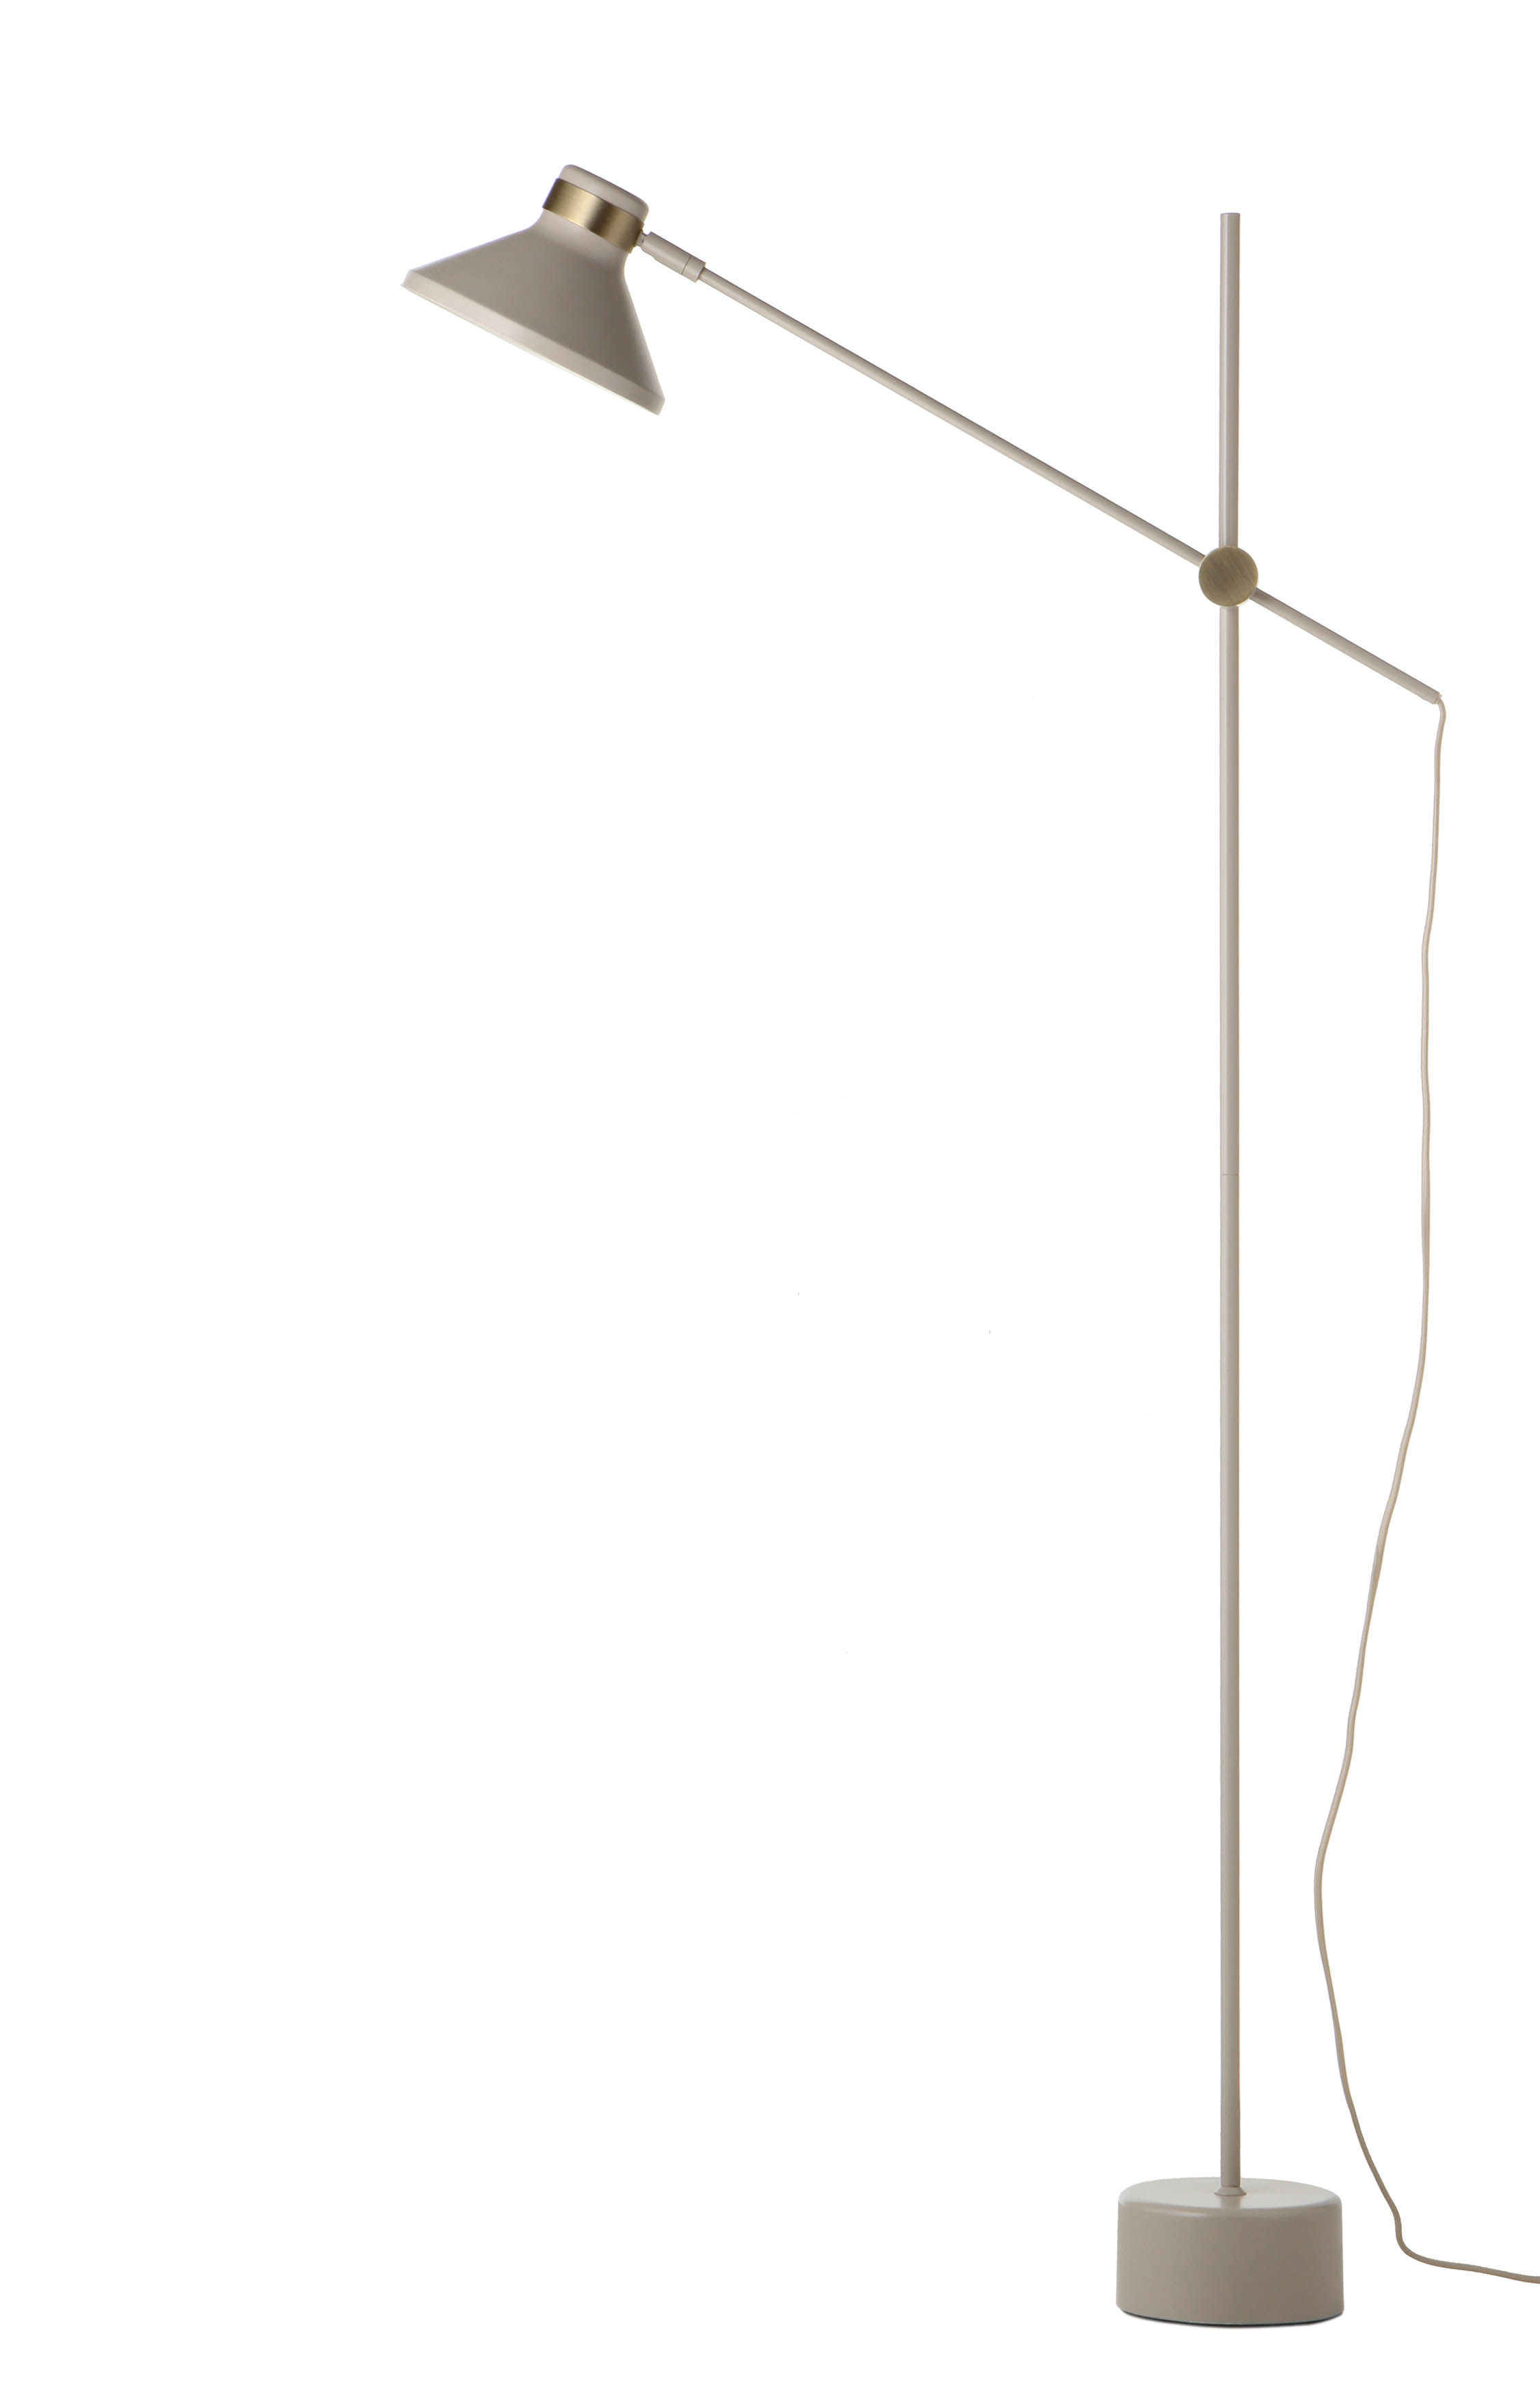 Lighting - Floor lamps - Mr Floor lamp - / Metal - H 140 cm by Frandsen - Matt taupe - Painted metal